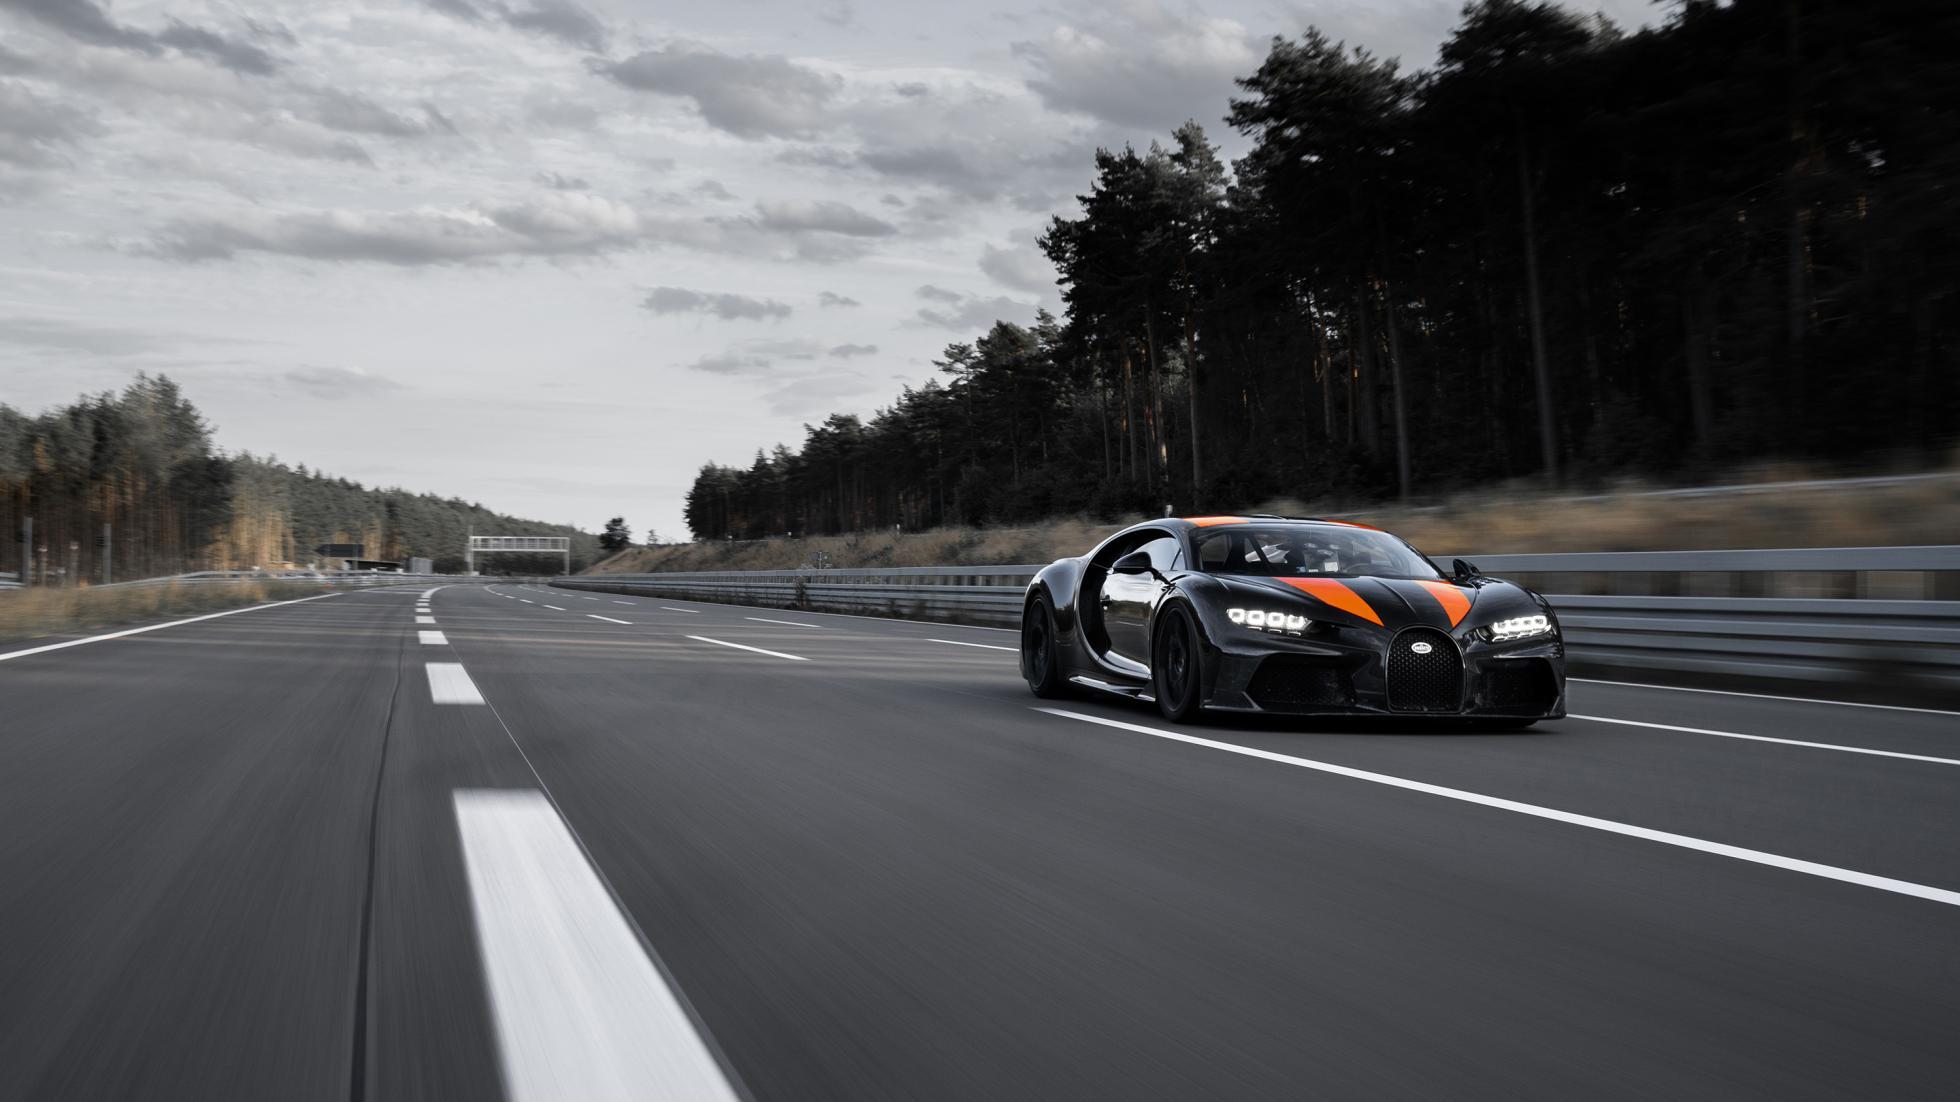 Bugatti-Chiron-Speed-record-6